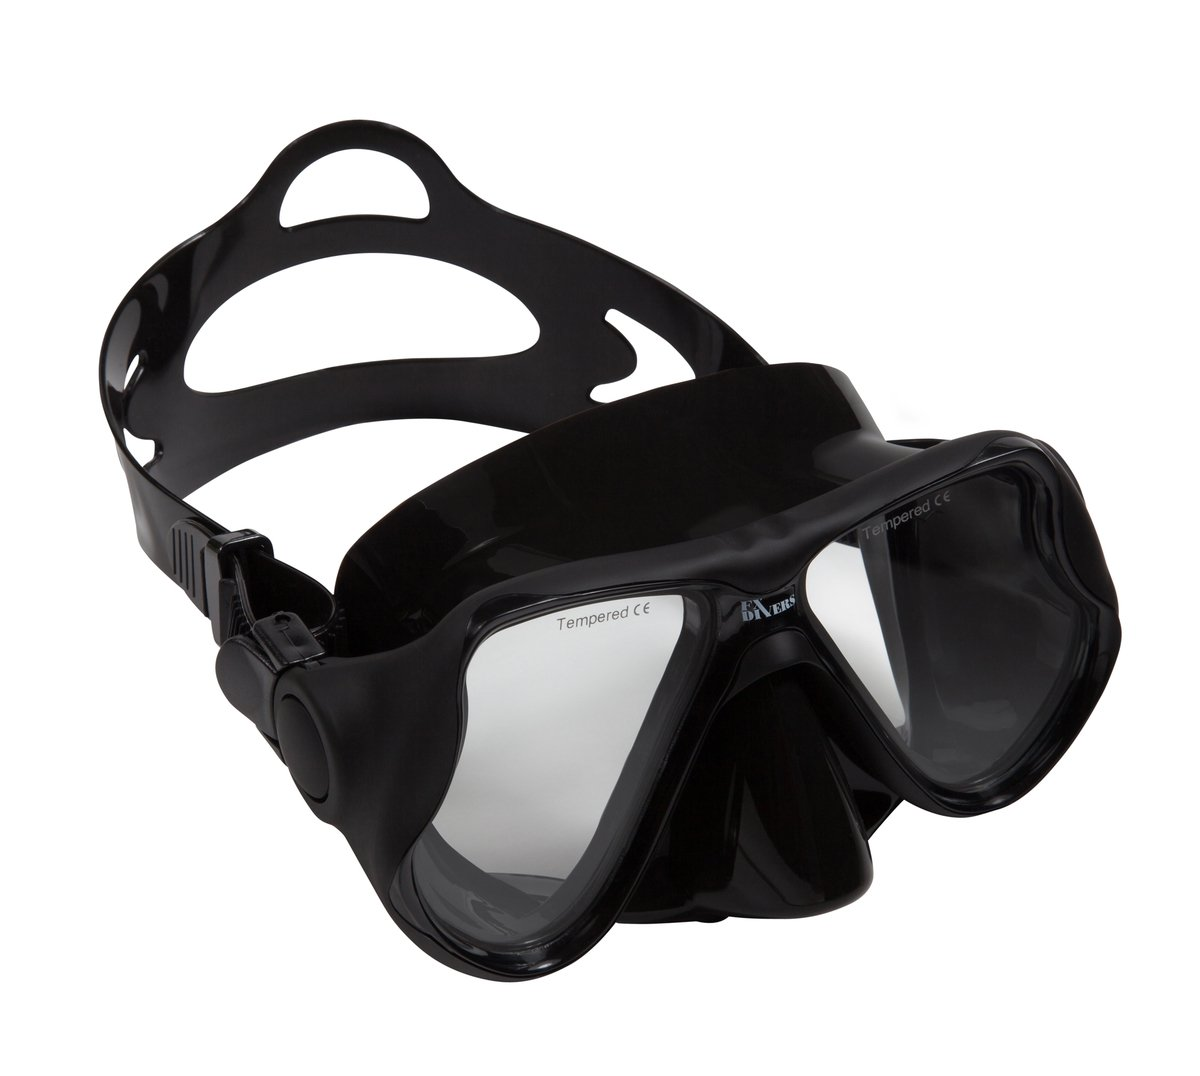 FX DIVERS Sea Pro Mask